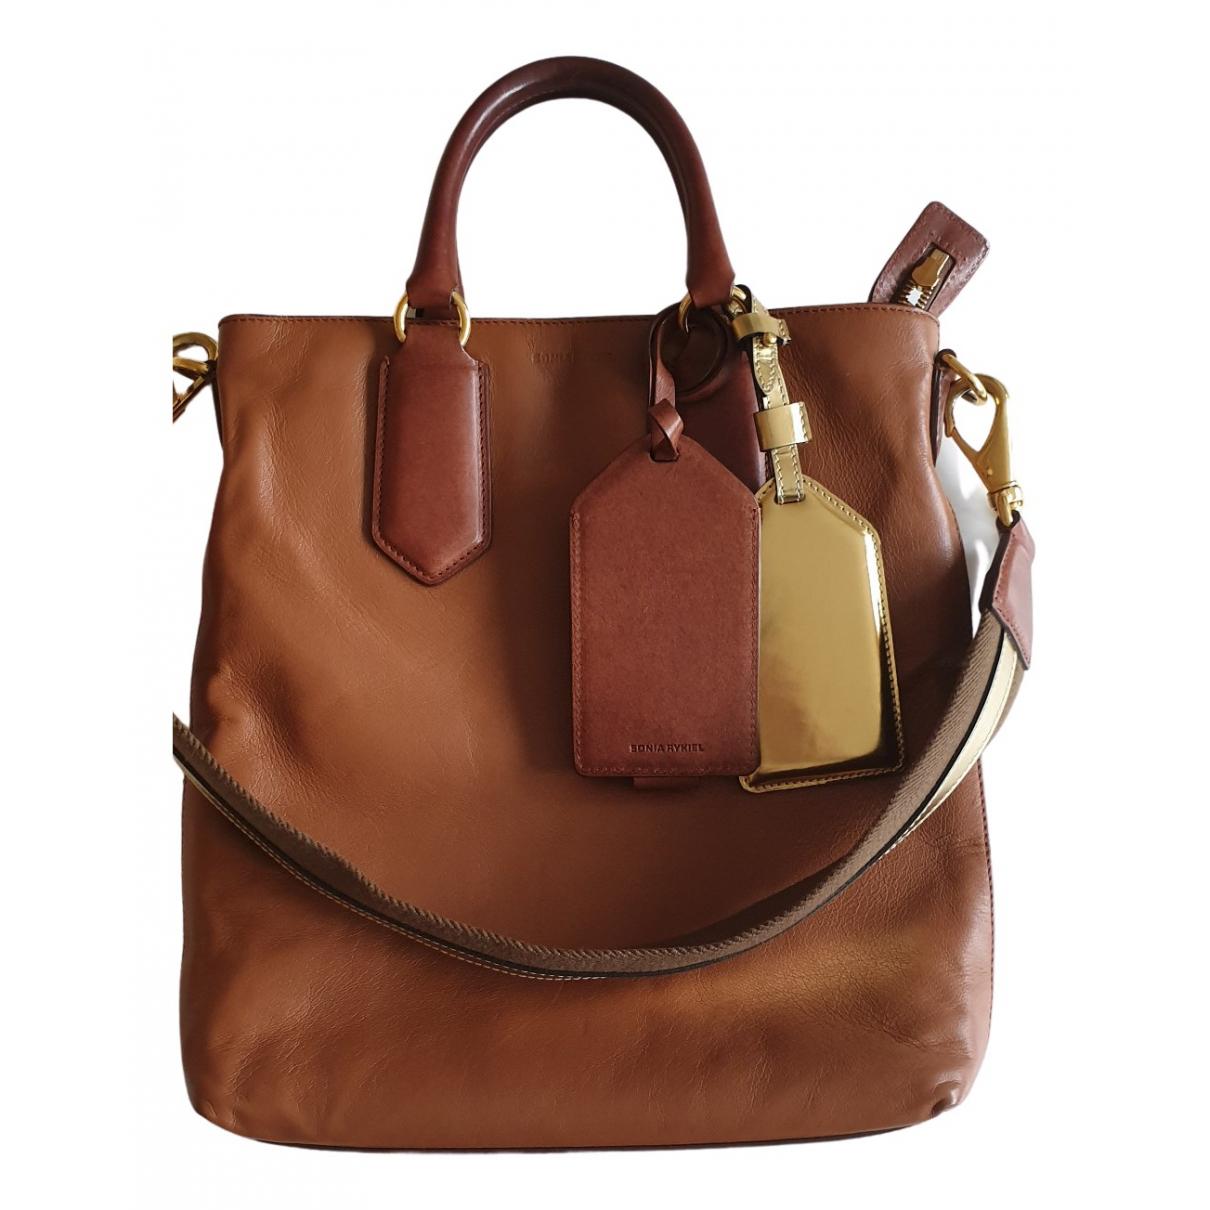 Sonia Rykiel \N Handtasche in  Kamel Leder